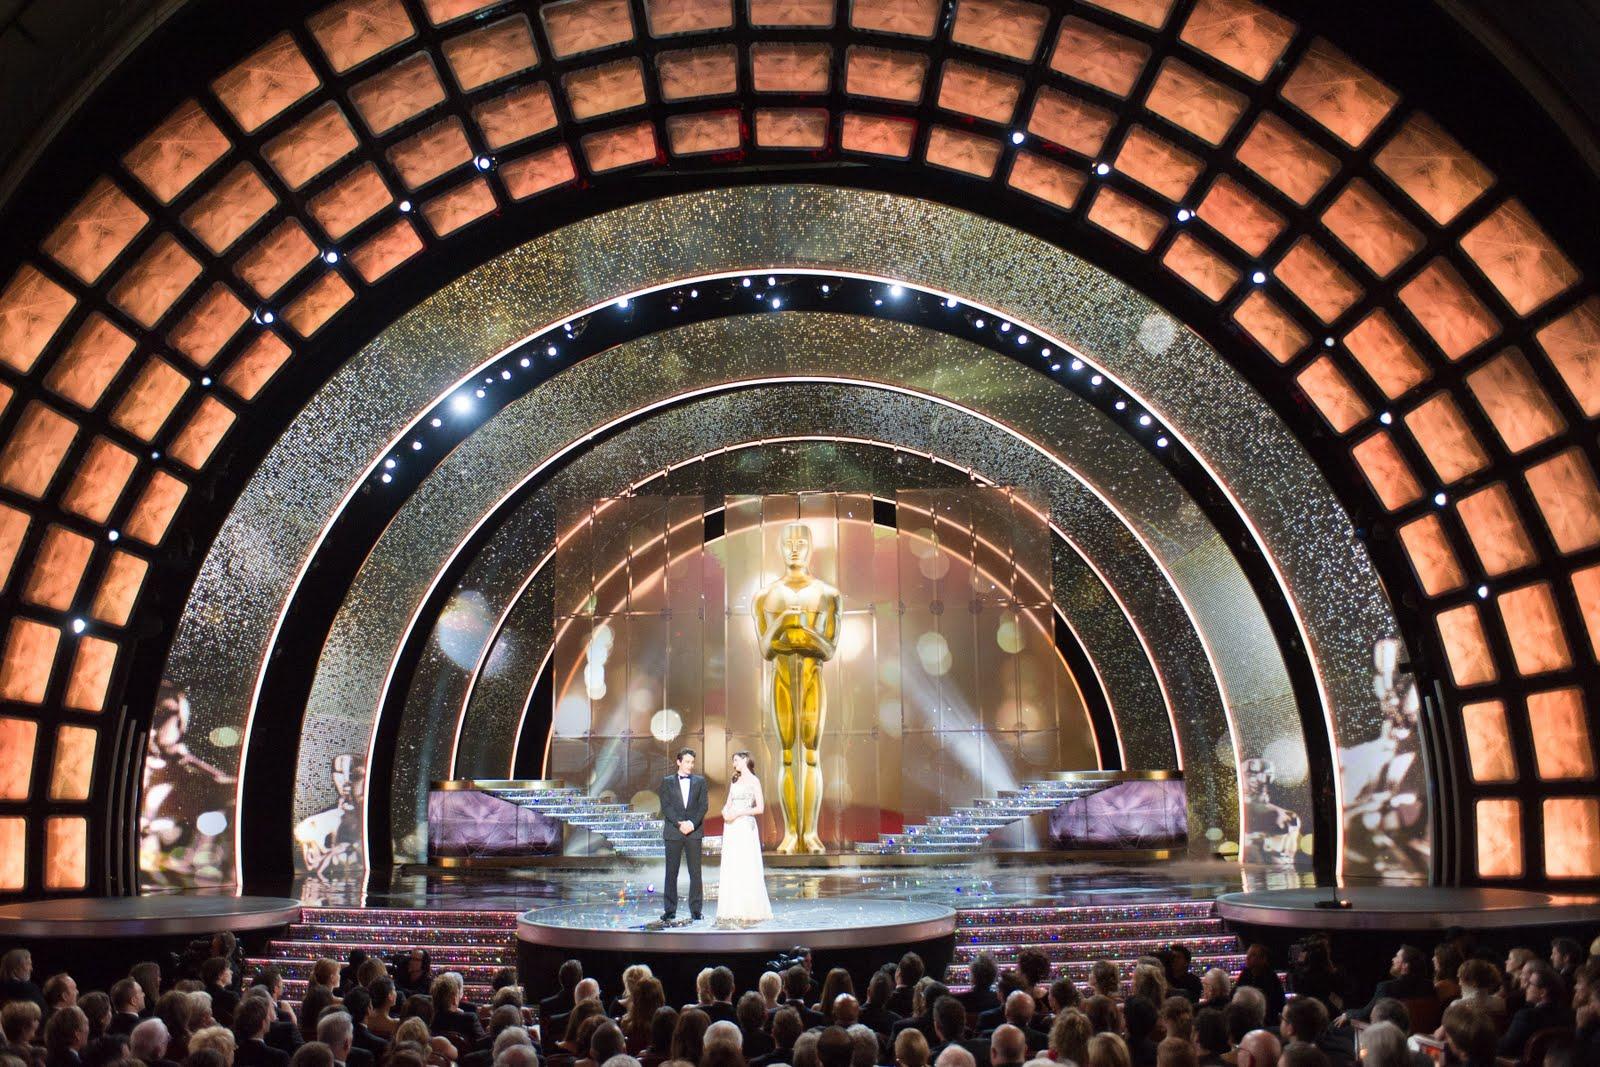 http://2.bp.blogspot.com/-N1OPJX_V0co/TWtCKFxsa6I/AAAAAAAAFLc/hWi9EtEznj4/s1600/83rd_Oscars_stage.jpg